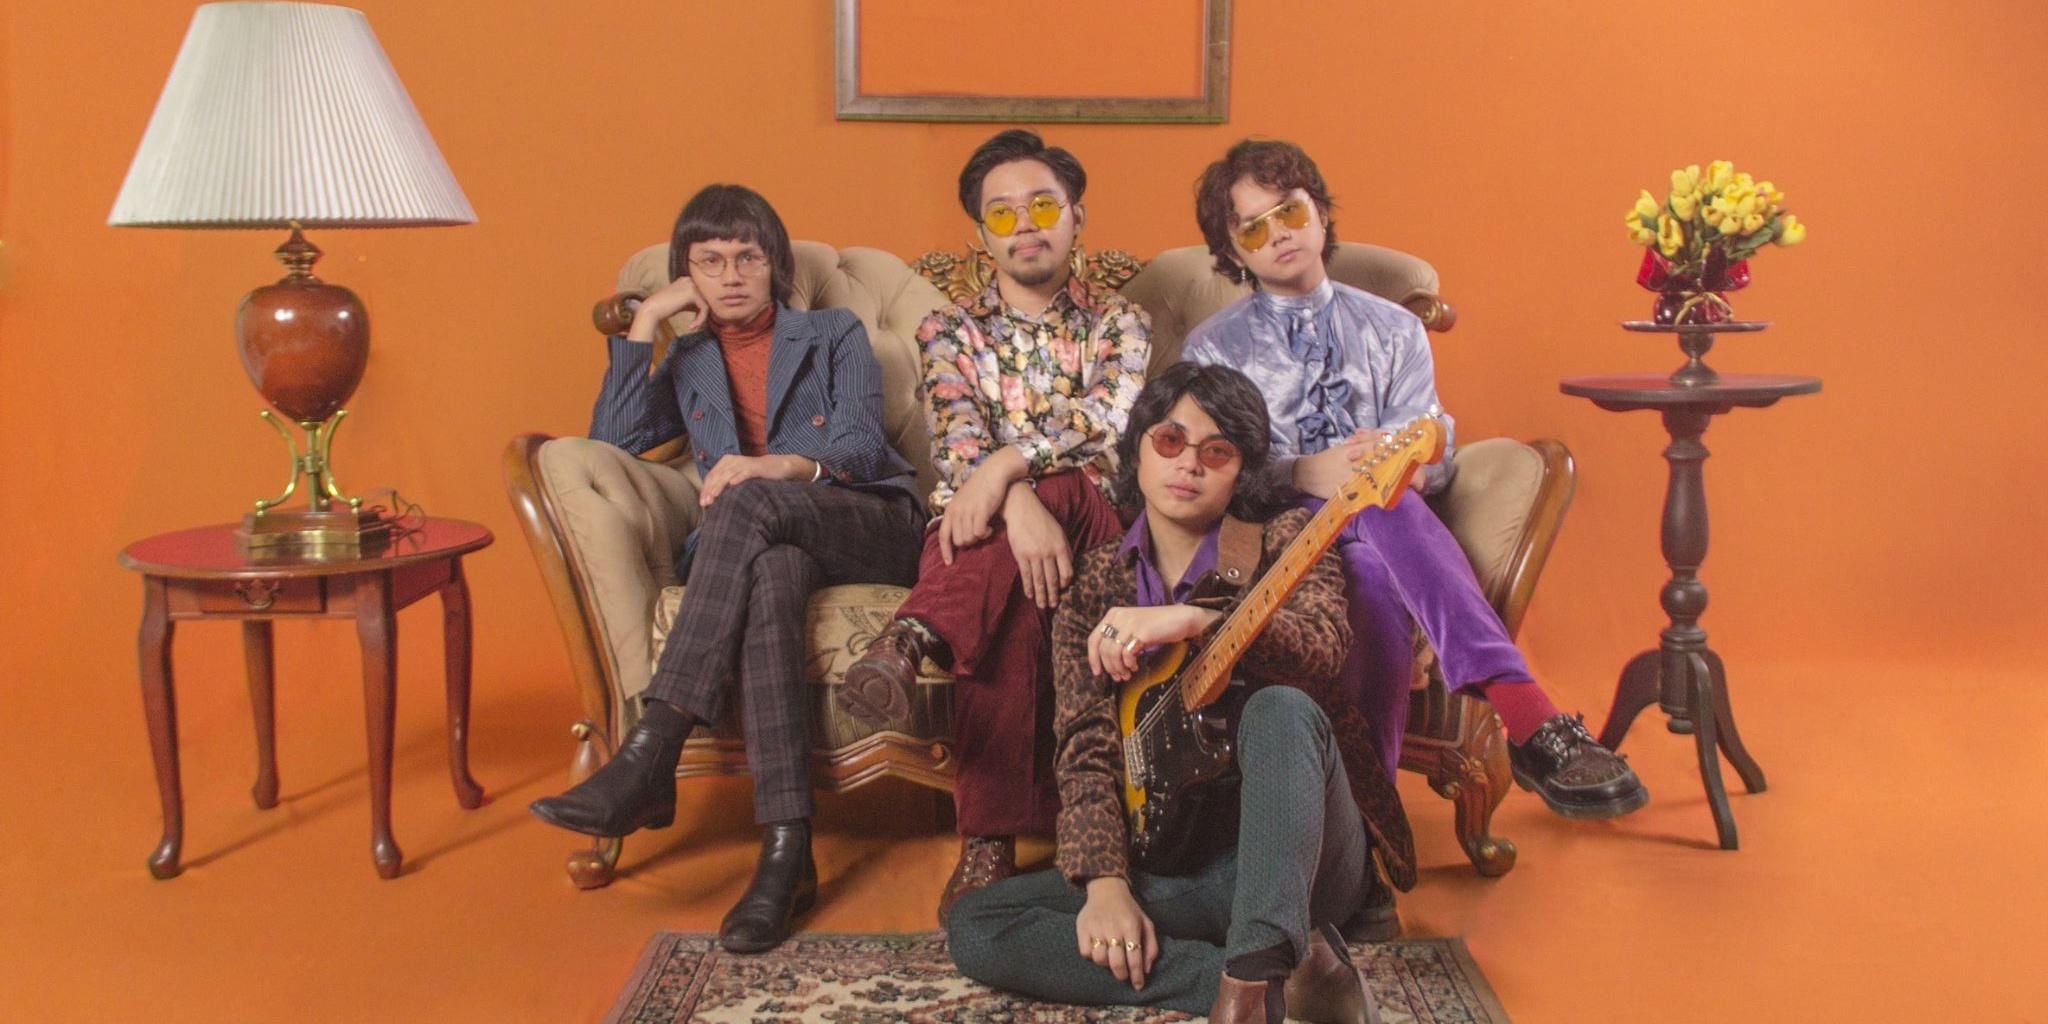 IV of Spades release new single, 'Mundo' – listen